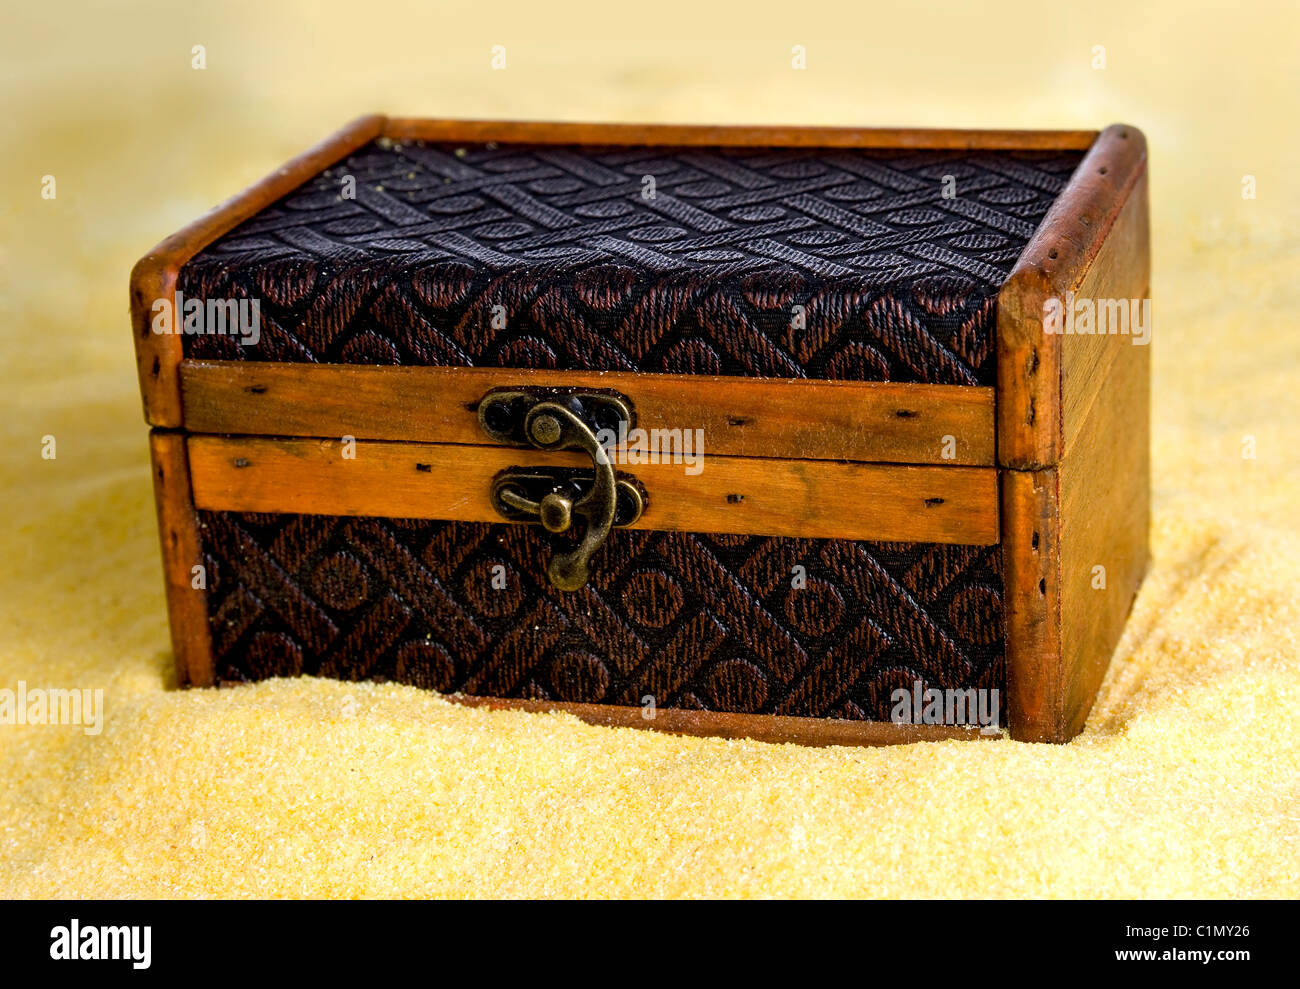 treasure chest - Stock Image